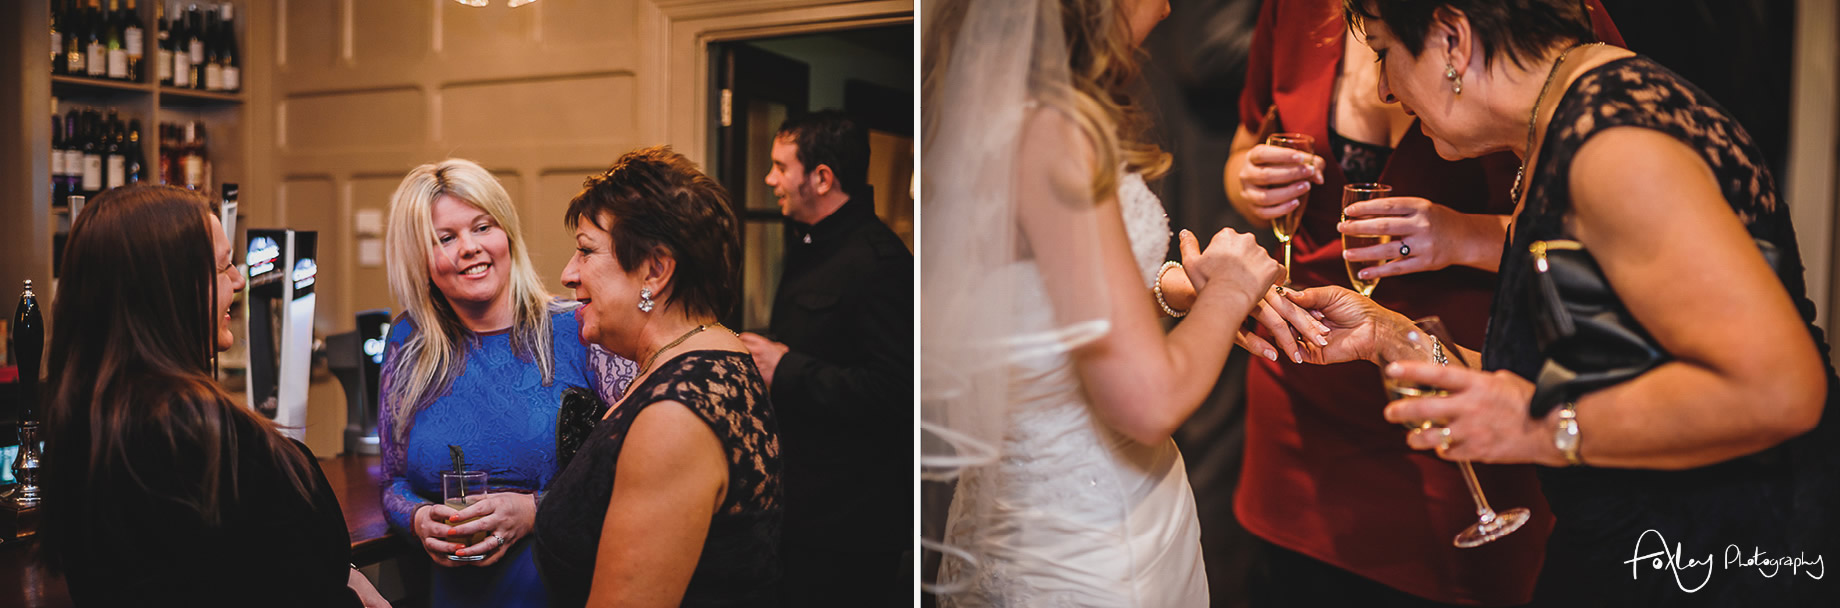 Gemma and Lewis' Wedding at Mitton Hall 140